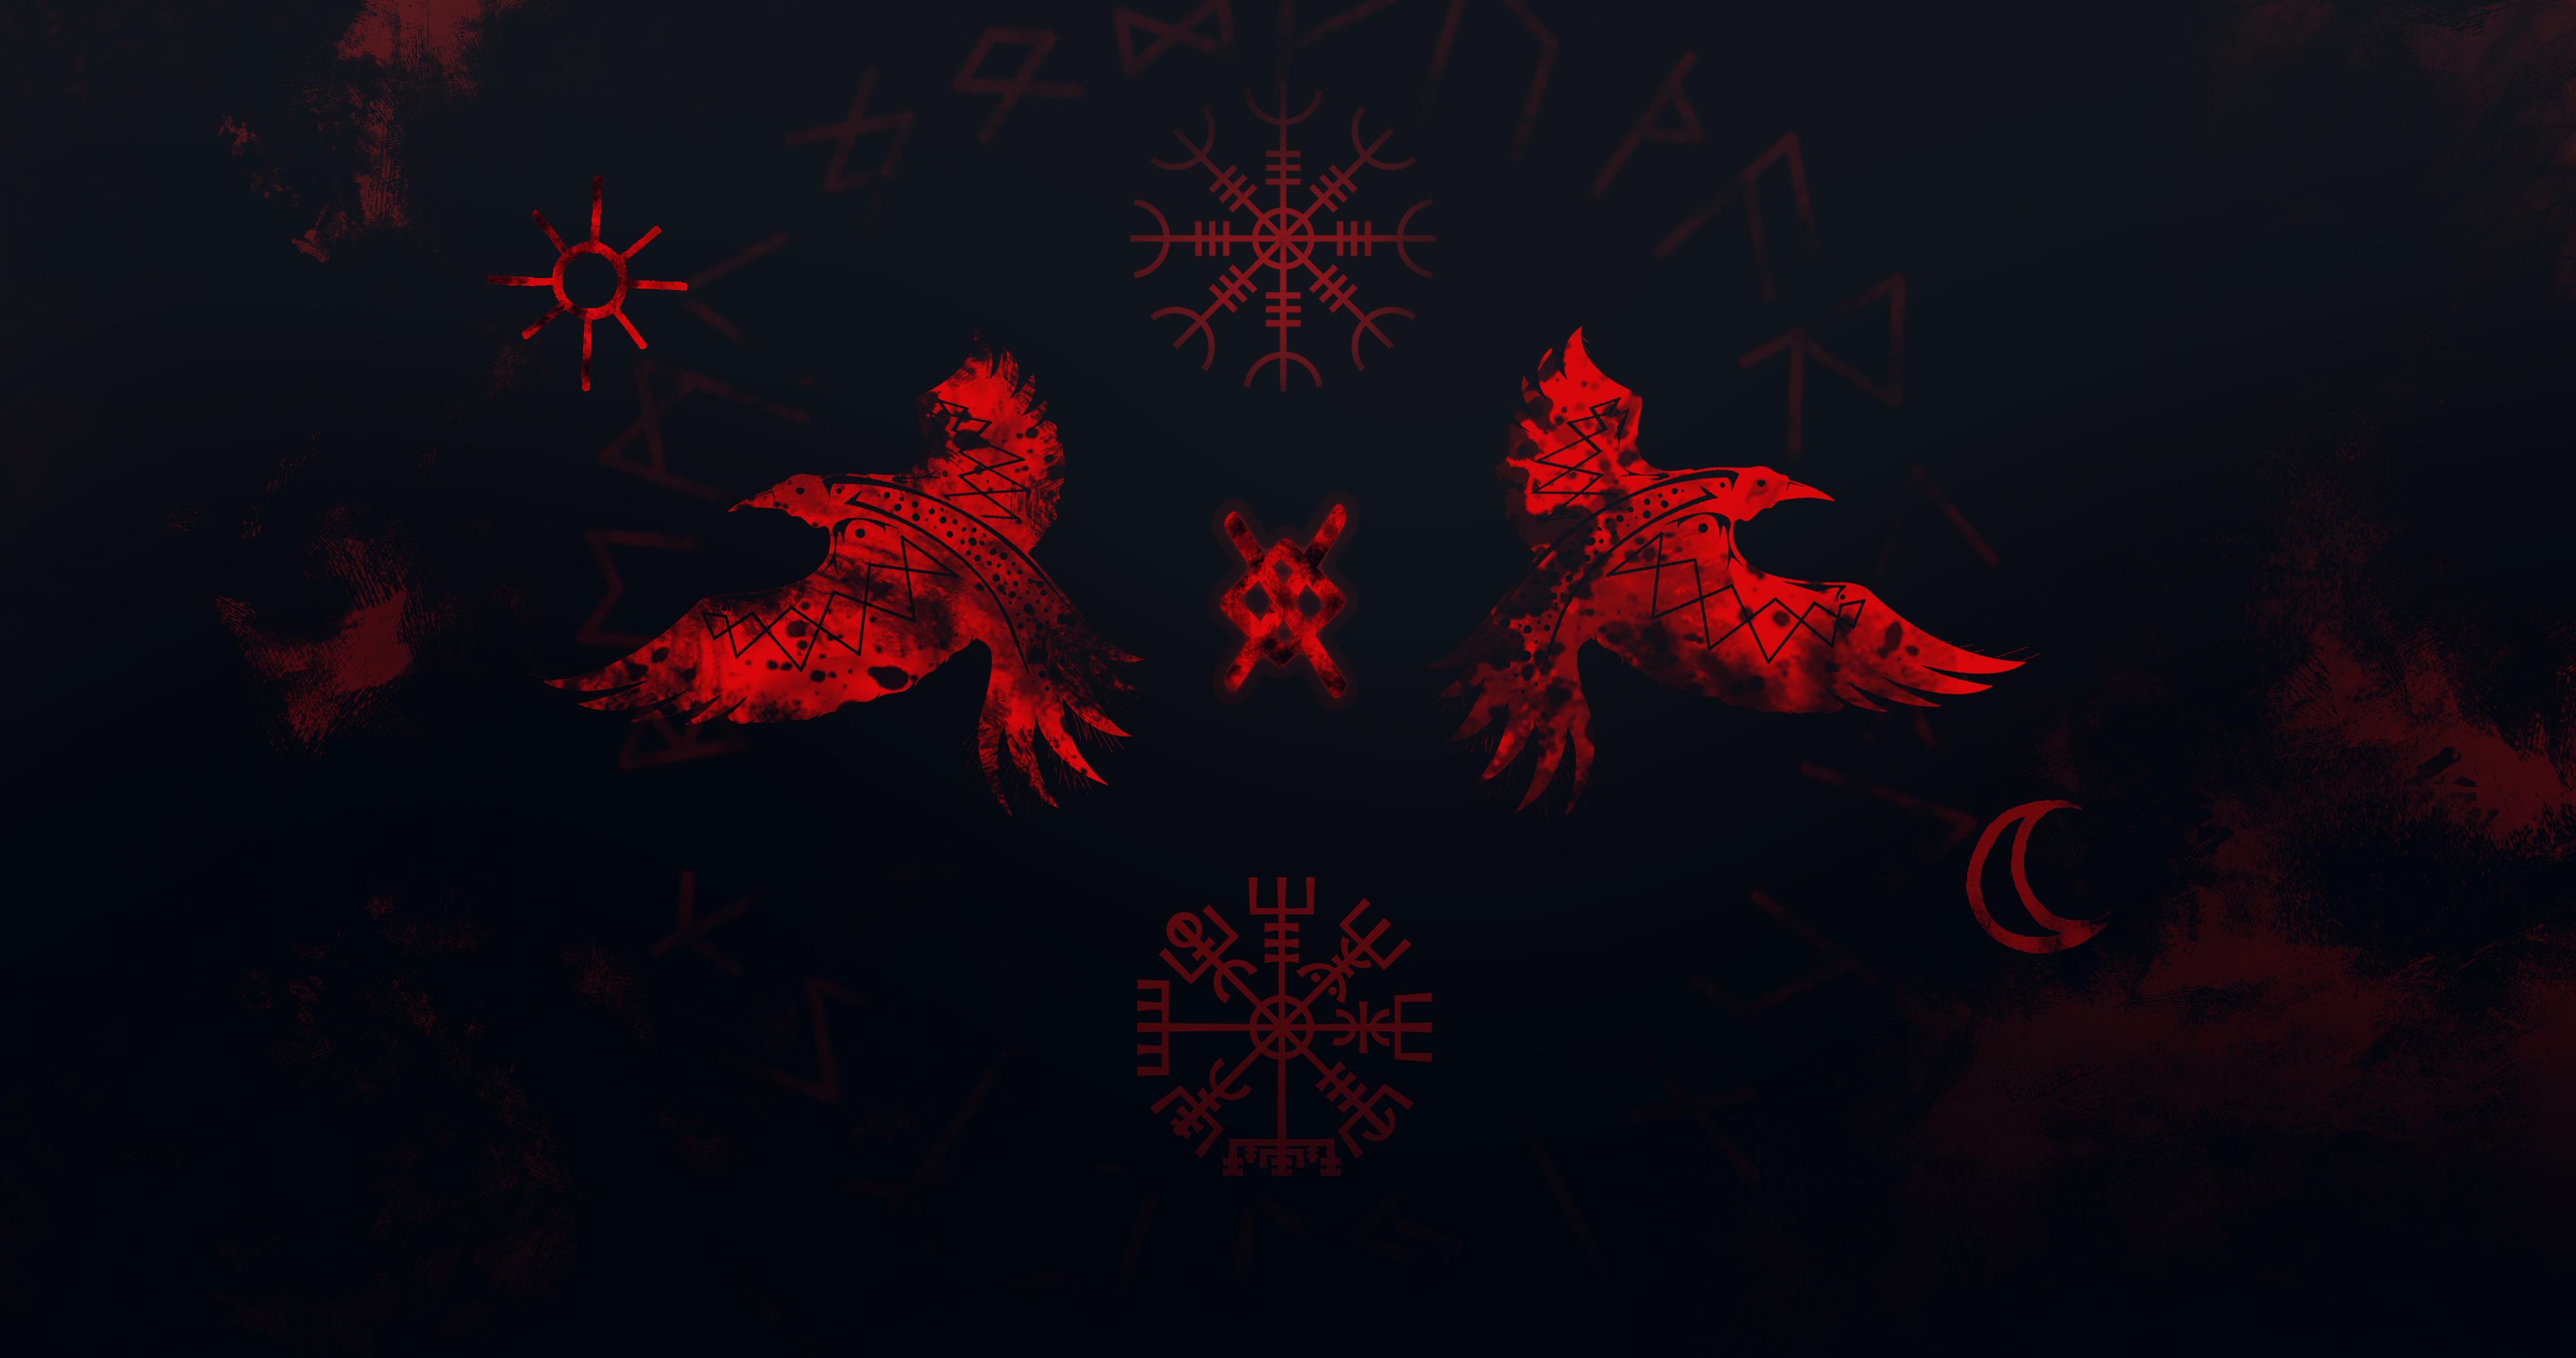 Vikings Raven 4k, HD Artist, 4k Wallpapers, Images ...